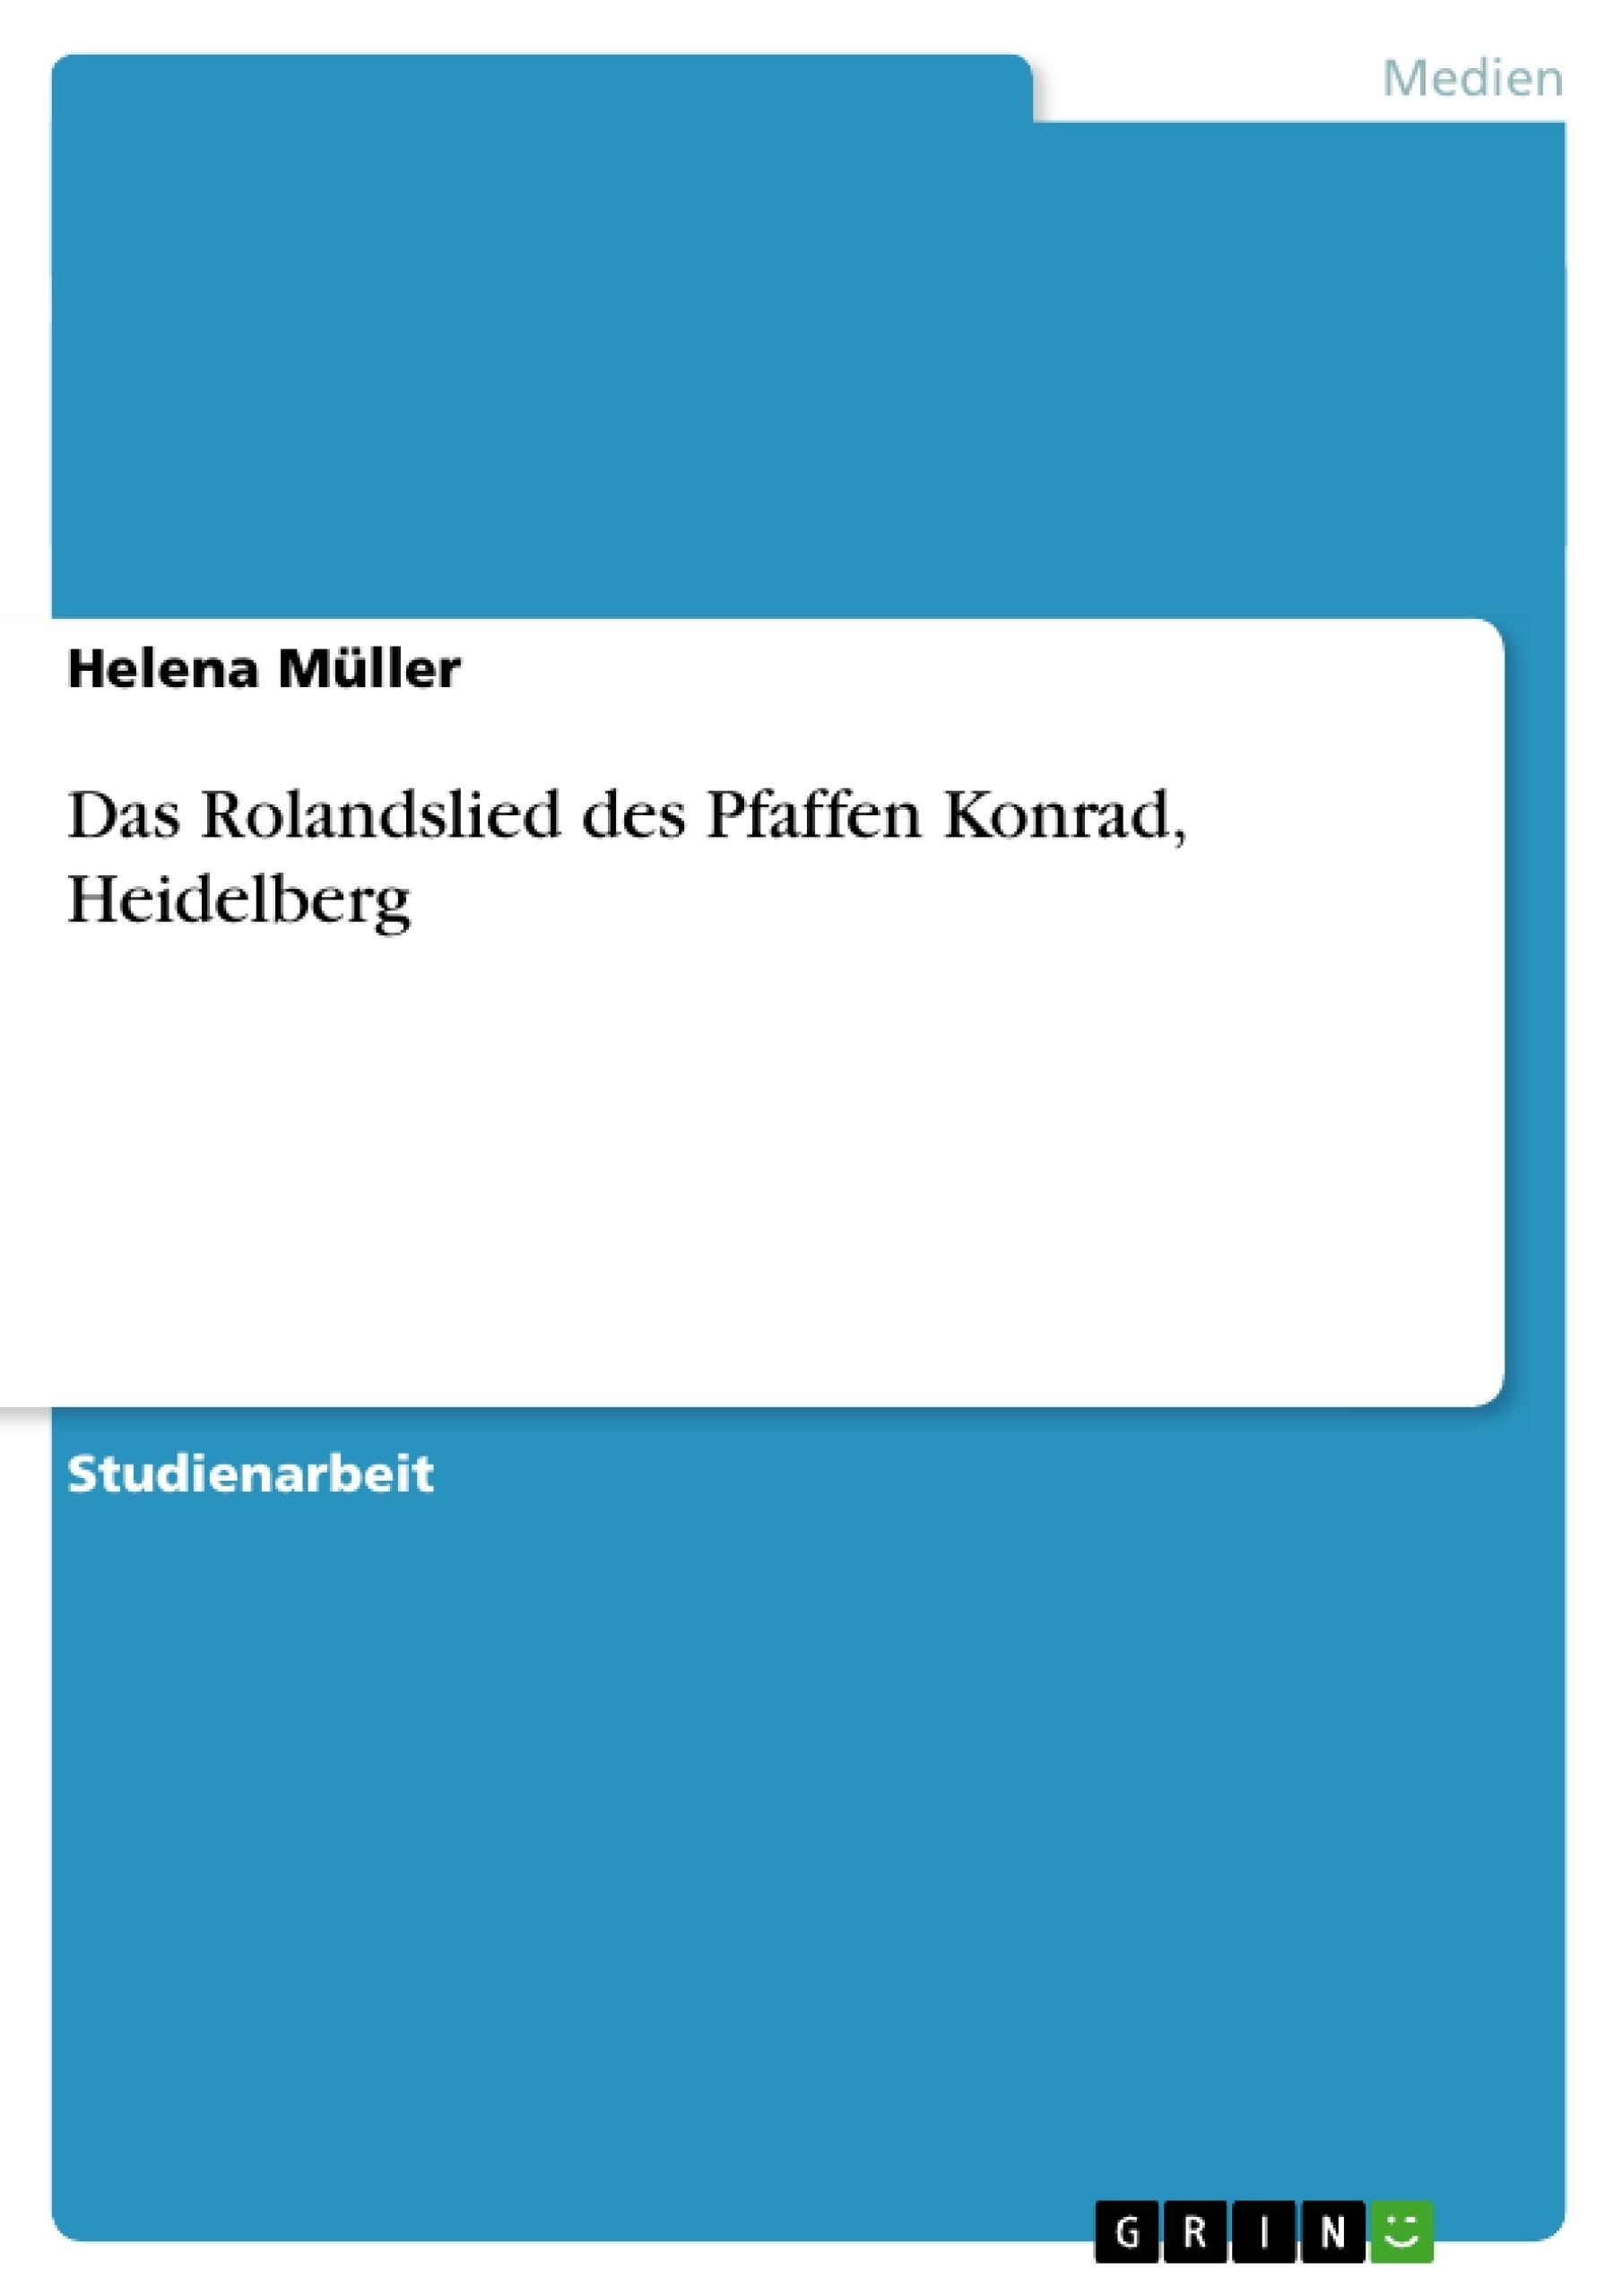 Titel: Das Rolandslied des Pfaffen Konrad, Heidelberg